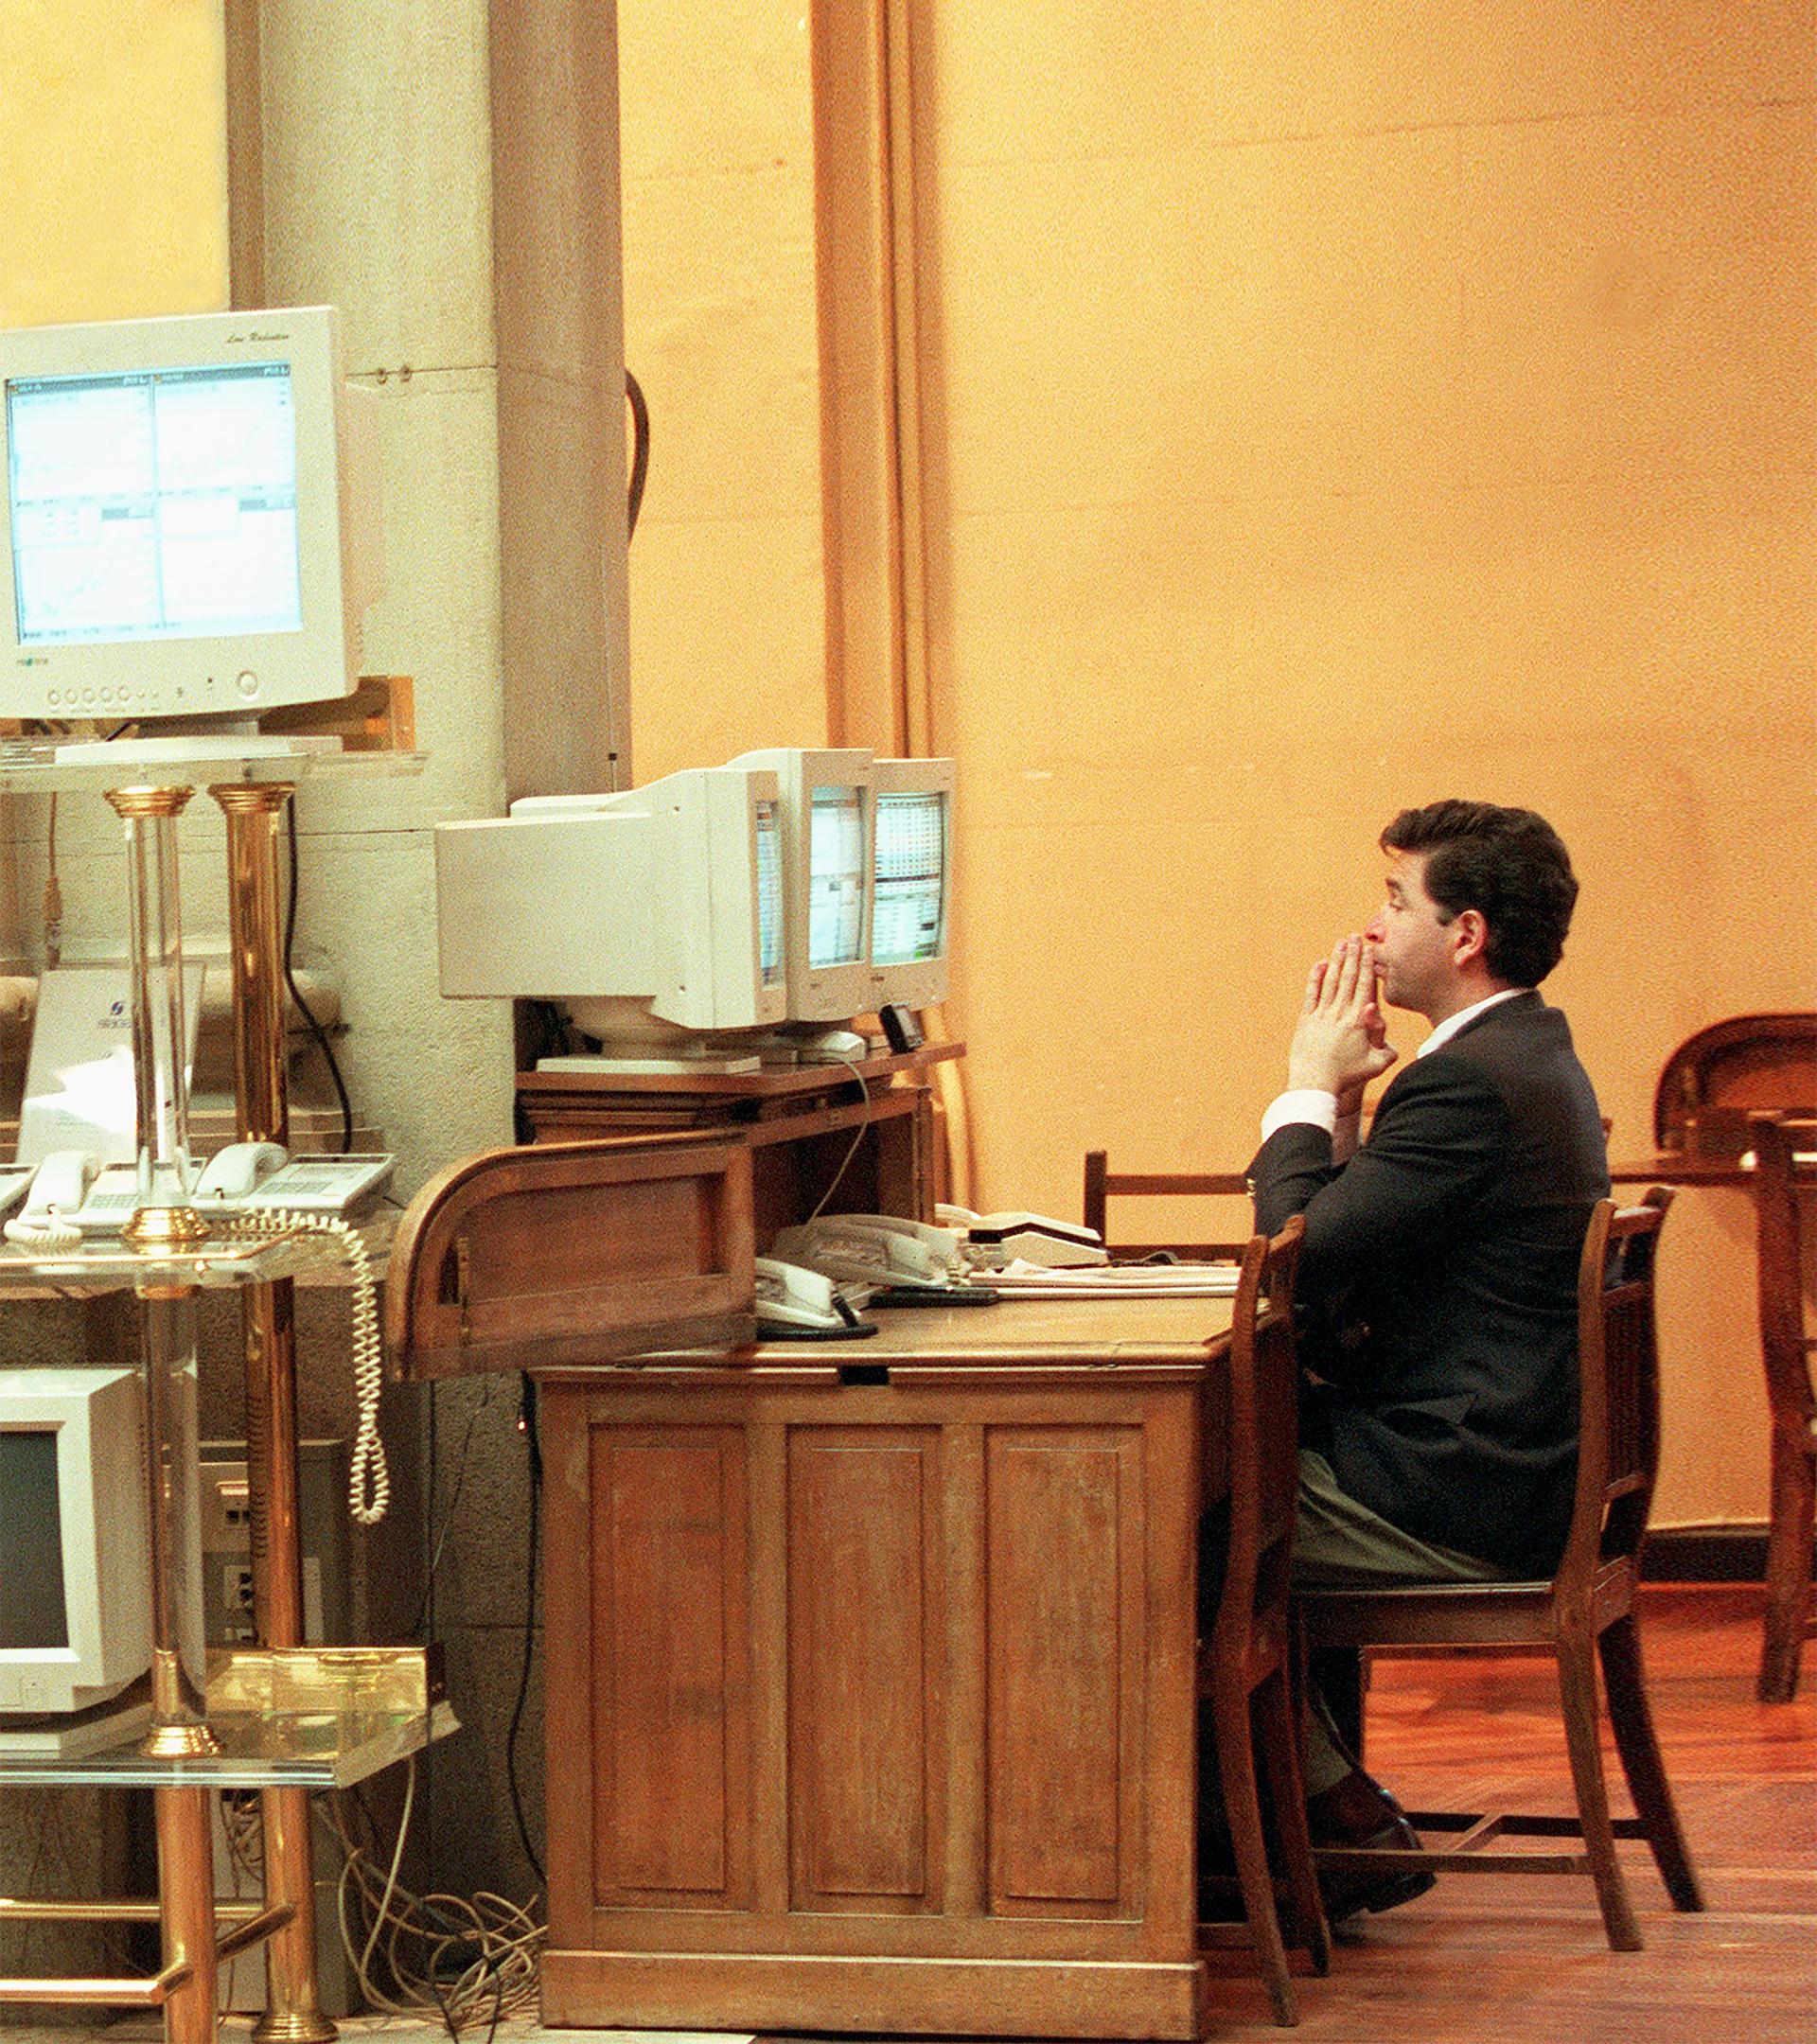 La lenta metamorfosis del Ibex: De la fiebre inmobiliaria a la anemia digital